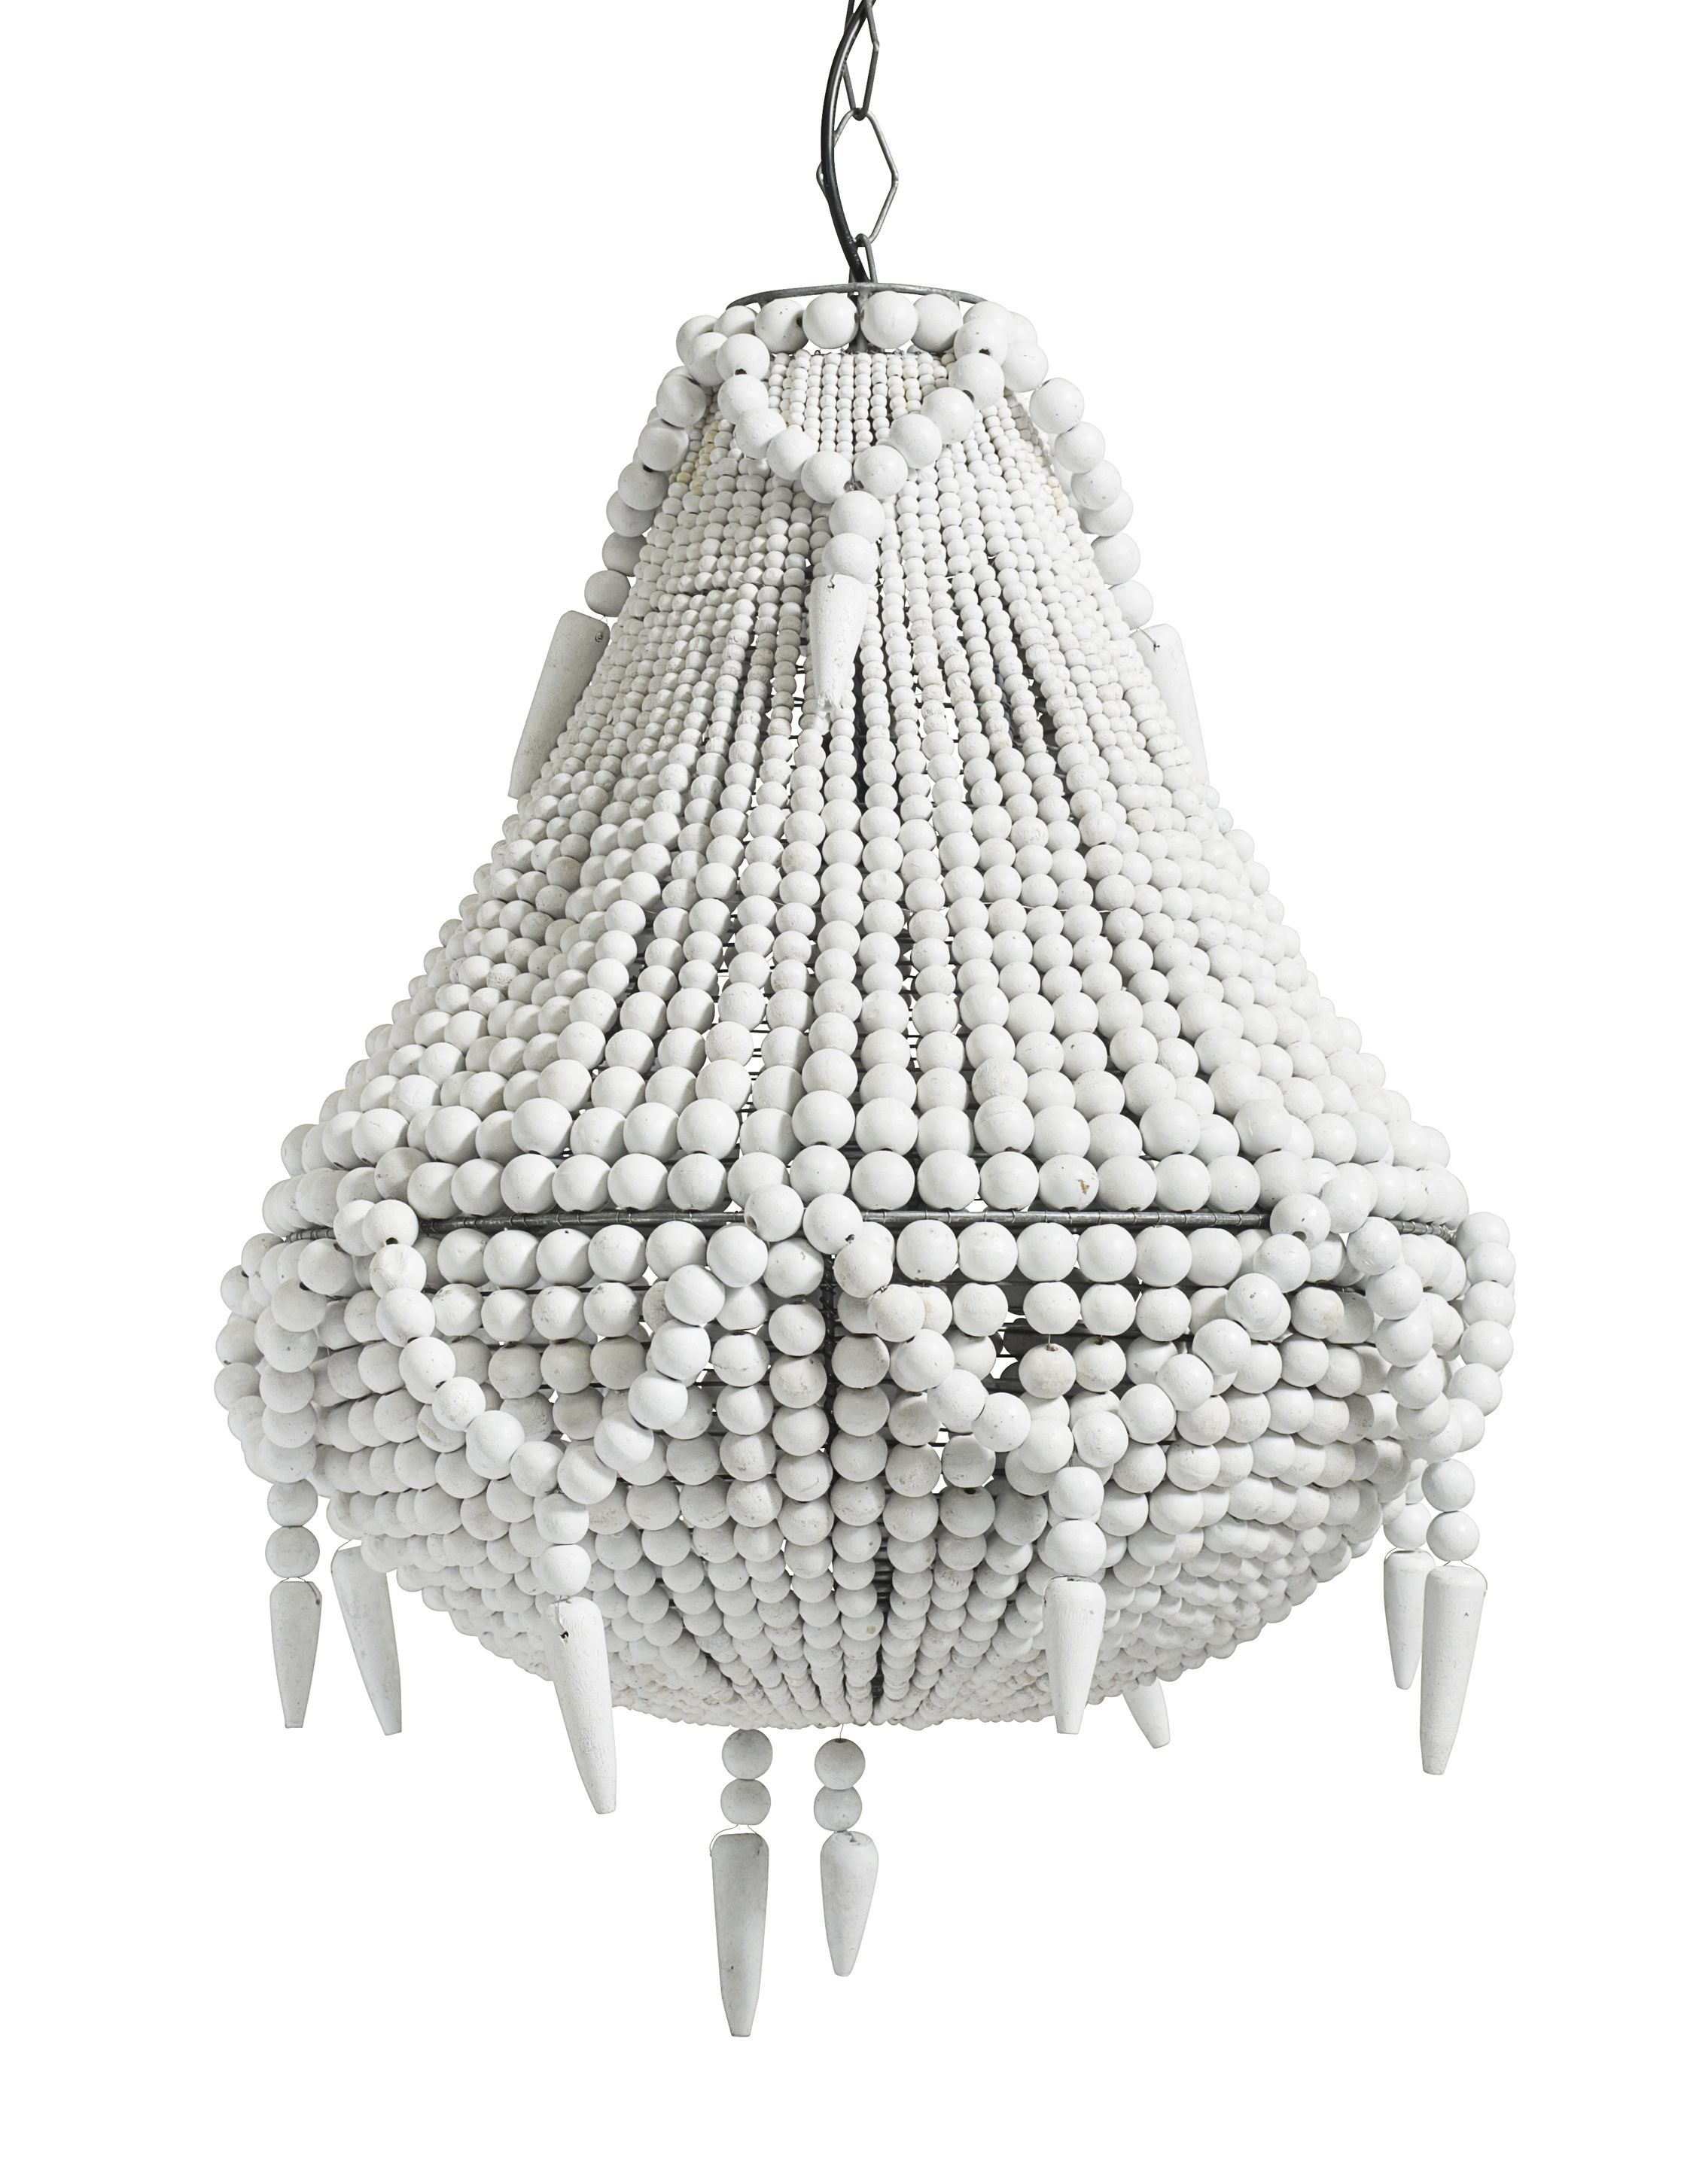 Lampa z koralikw drewnianych biaa loft more beads lampa z koralikw drewnianych biaa loft more pearl chandelierchandelierswooden arubaitofo Image collections